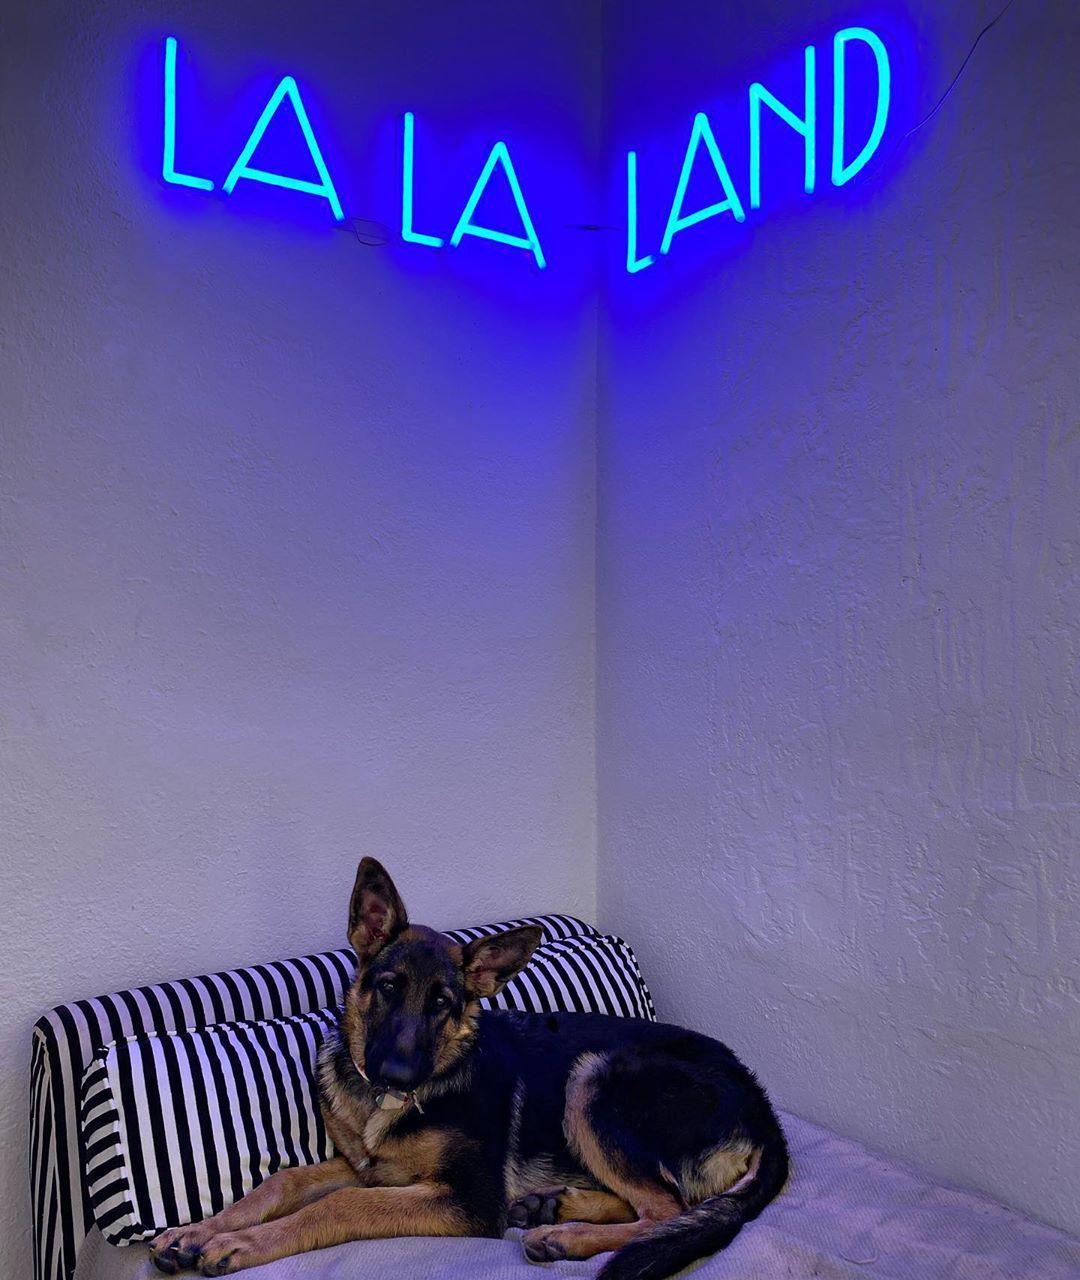 custom neon sign lalaland